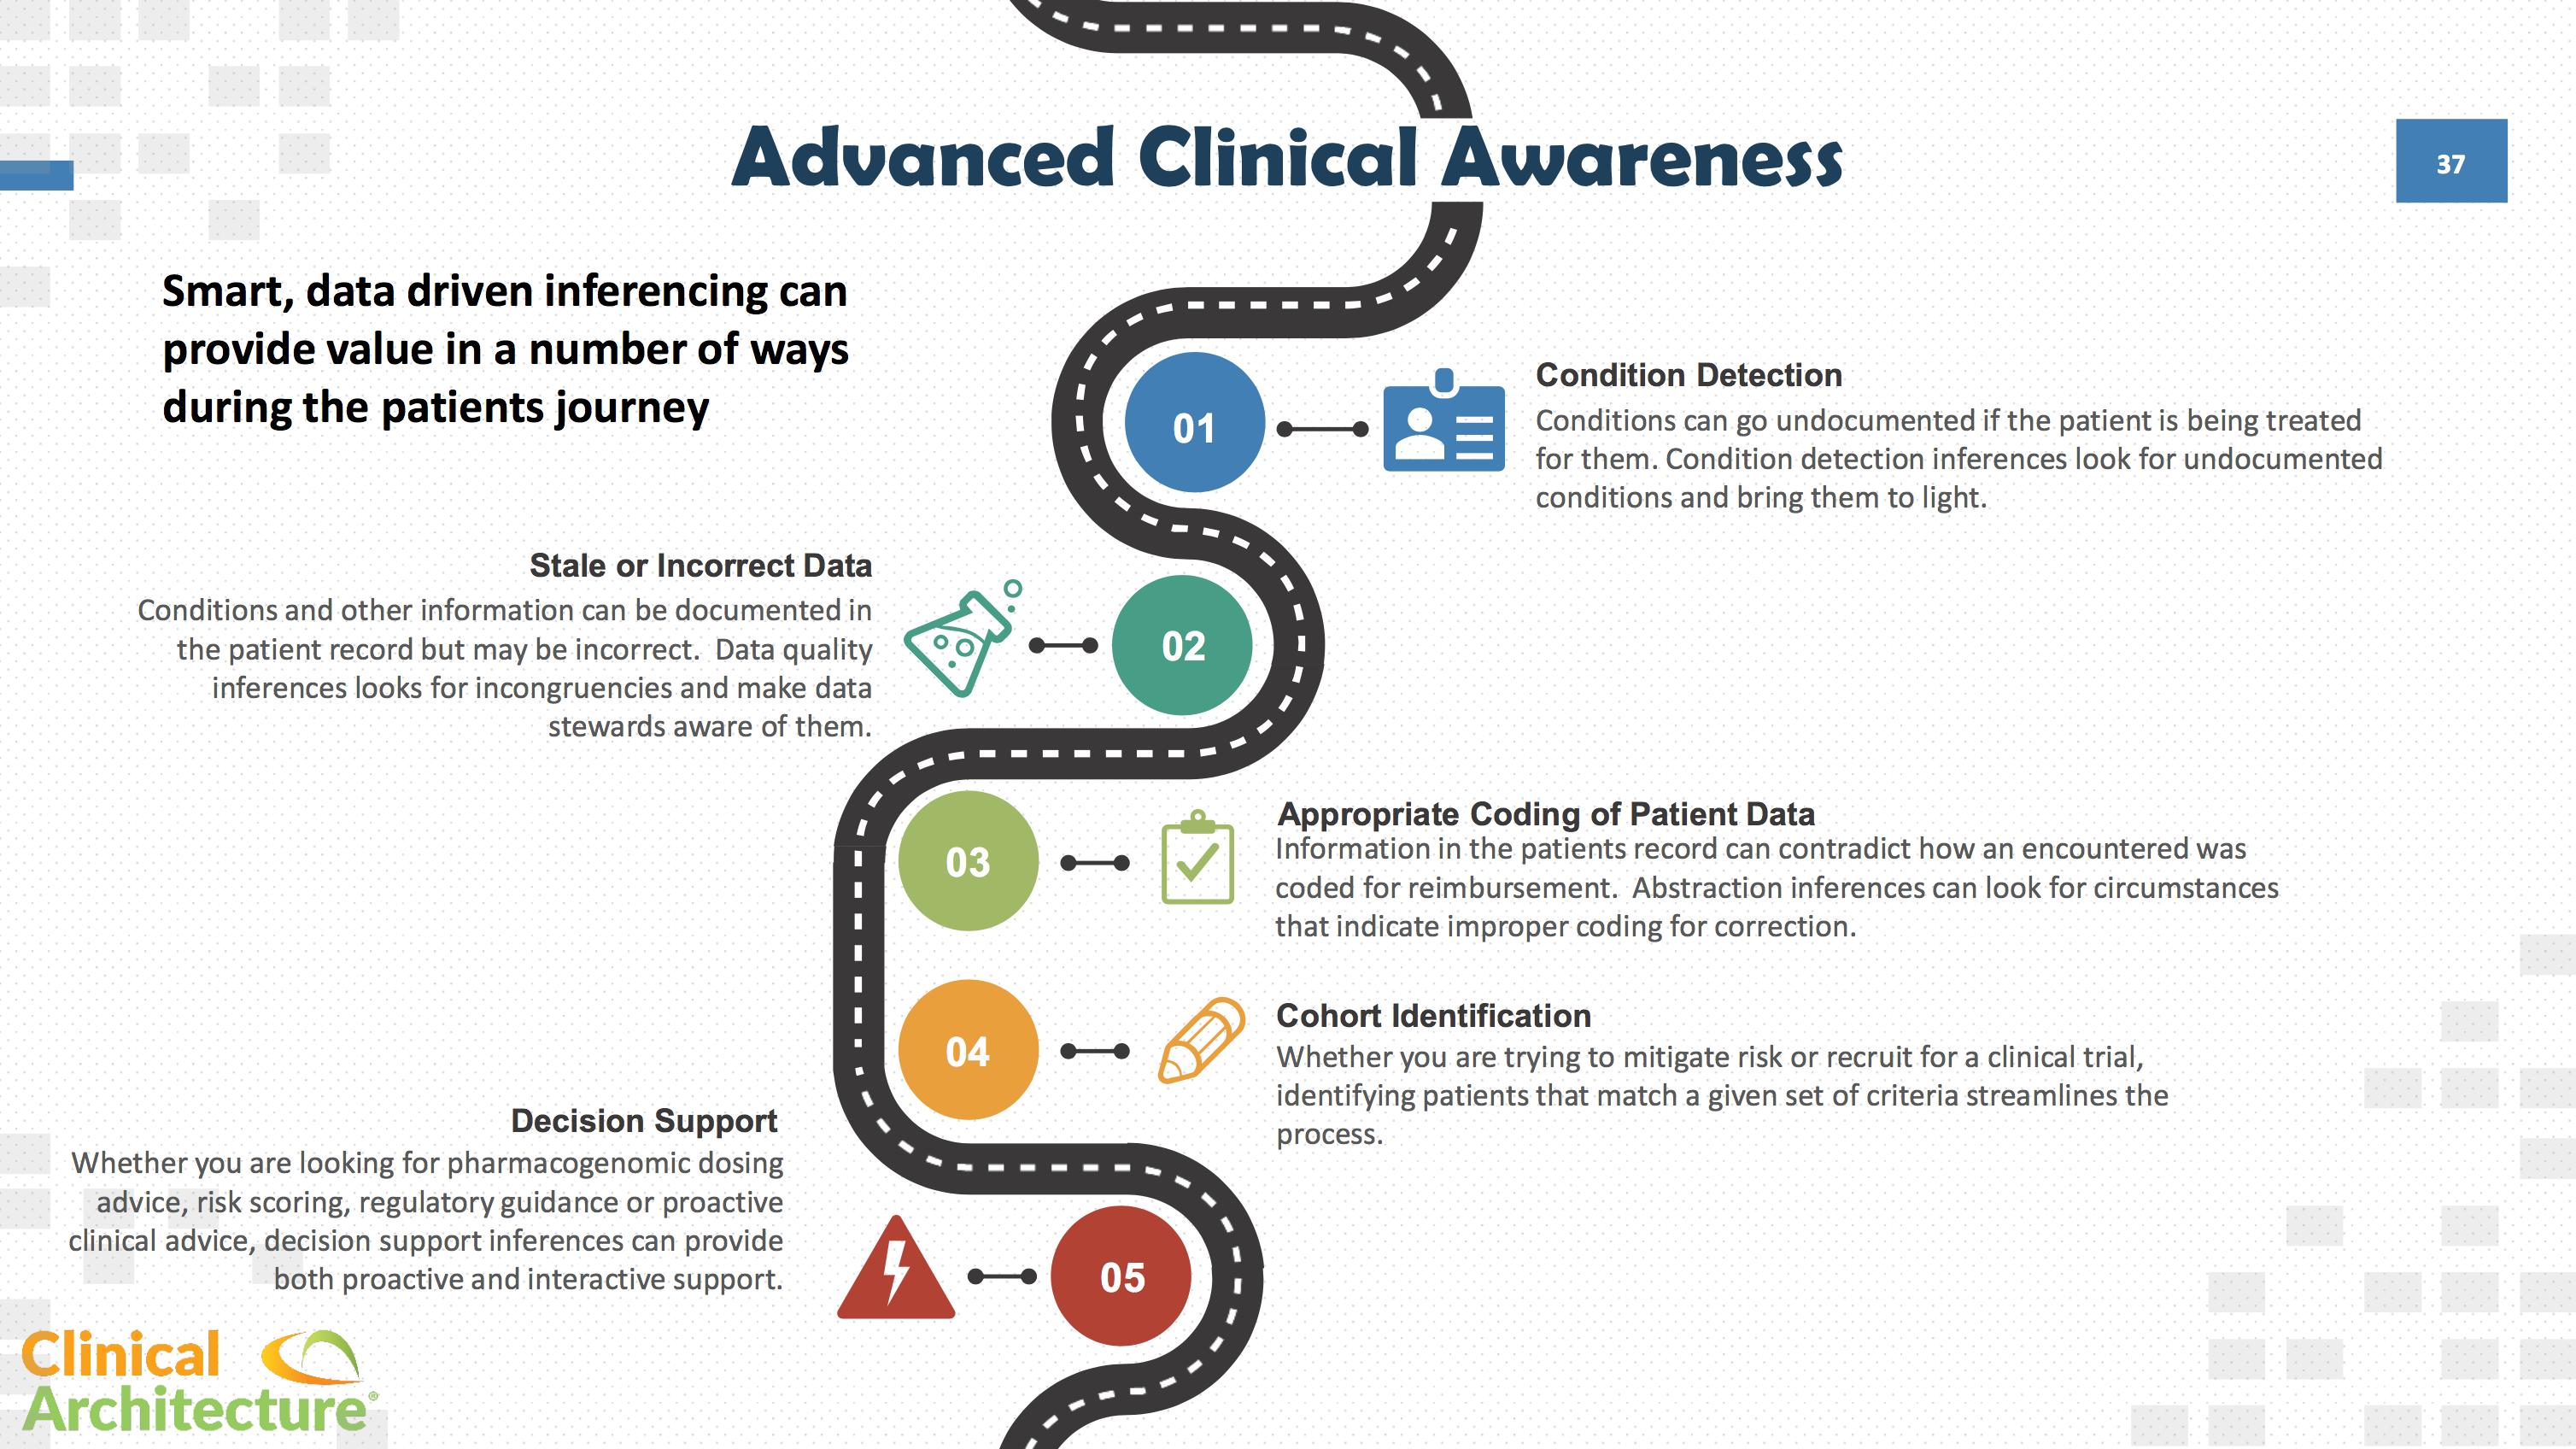 Advanced Clinical Awareness